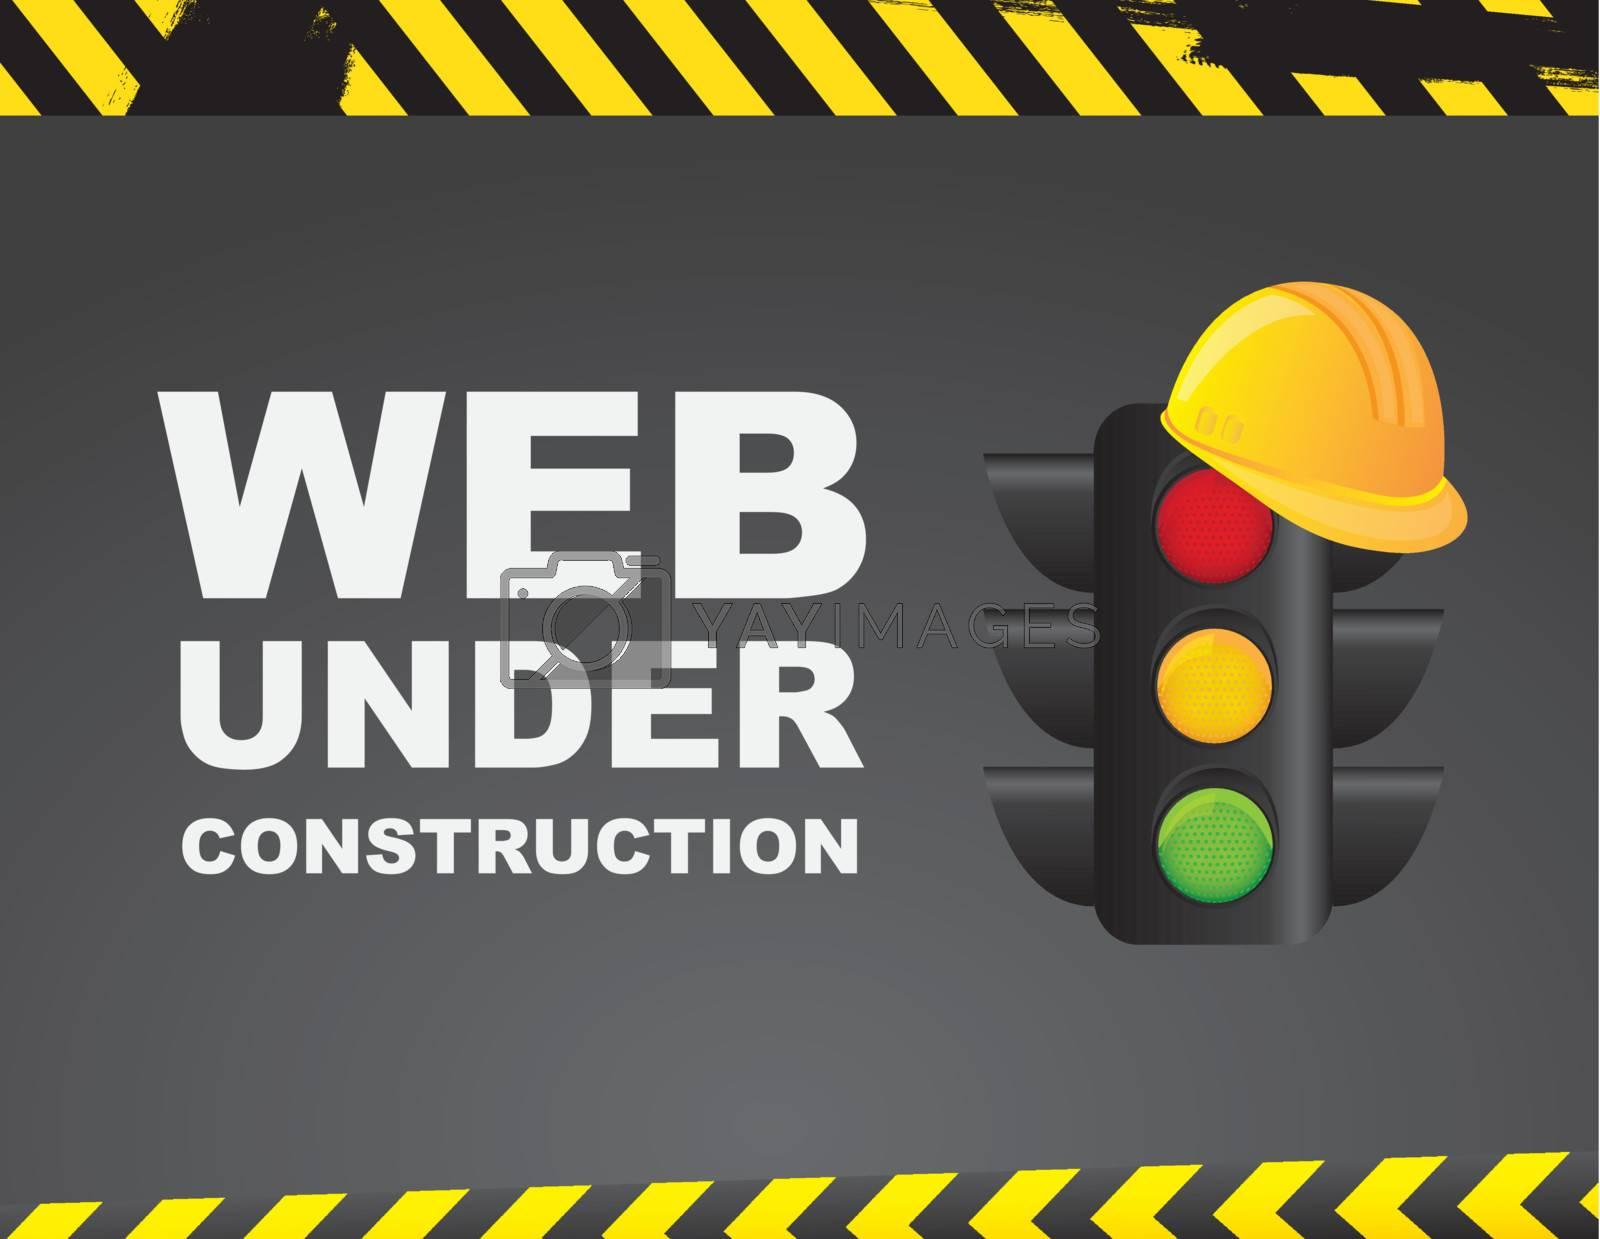 Web under construction over caution background